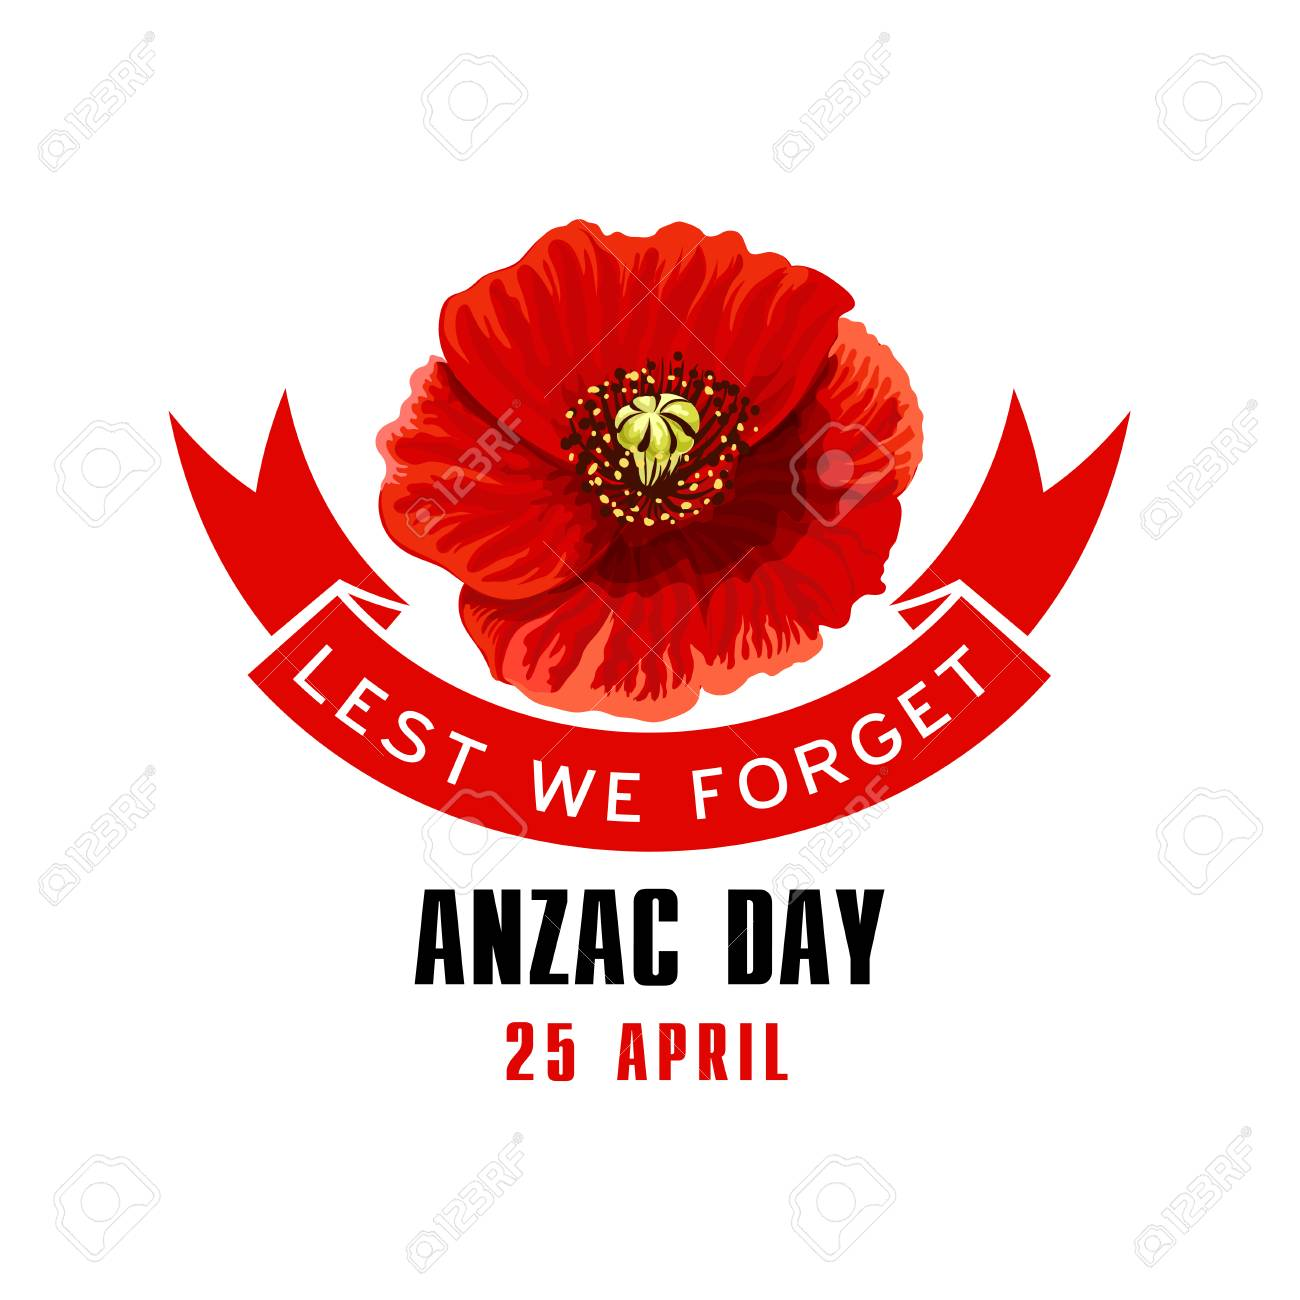 Anzac day lest we forget card with poppy flower royalty free anzac day lest we forget card with poppy flower stock vector 94133747 mightylinksfo